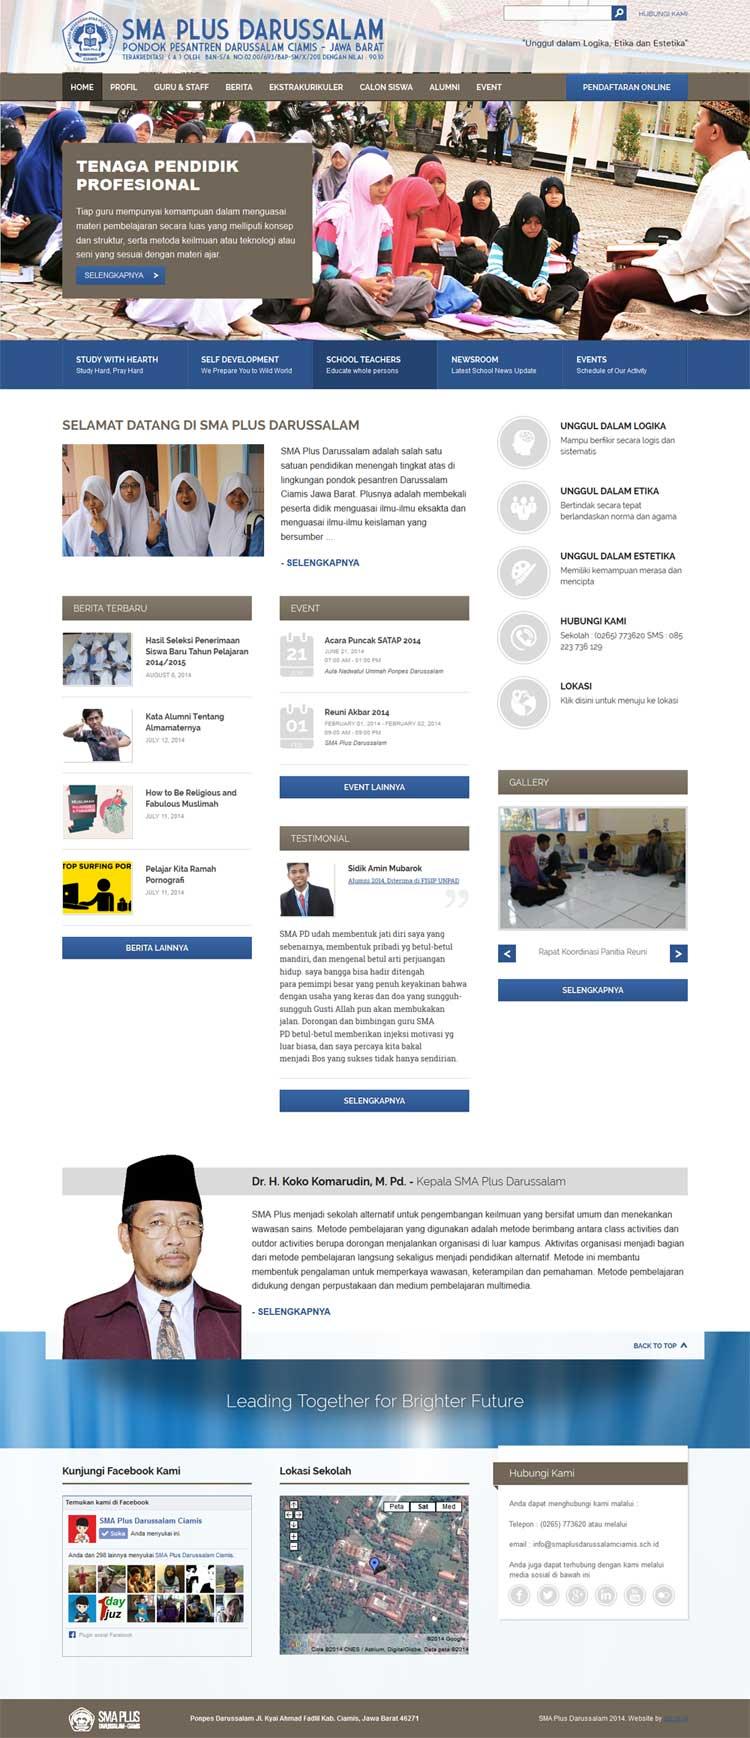 Halaman utama website sma plus darussalam ciamis